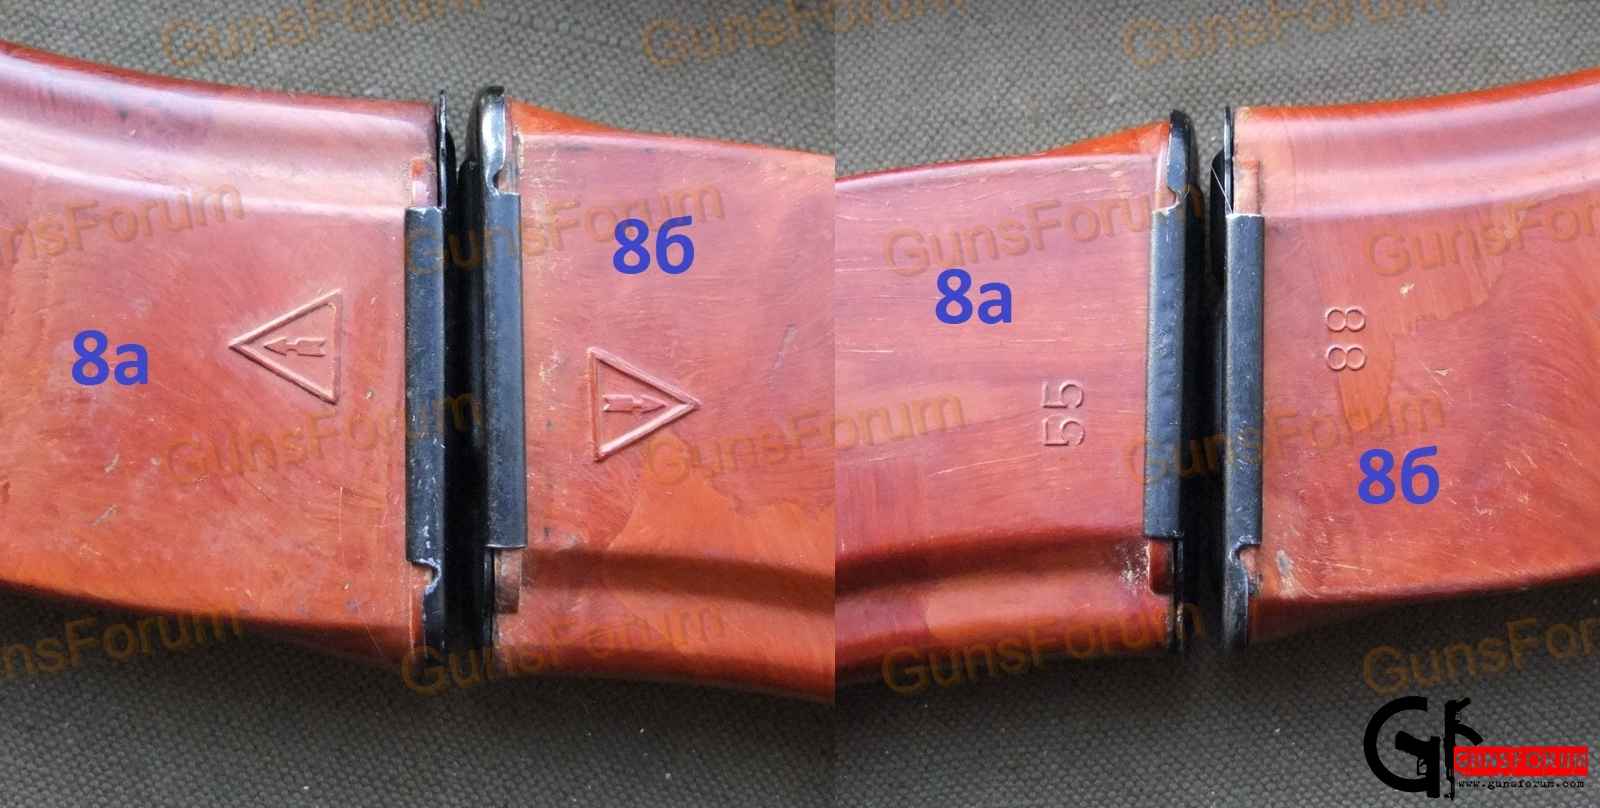 large_50.JPG.47e867b9096d7831960633f4b00c8e59.JPG